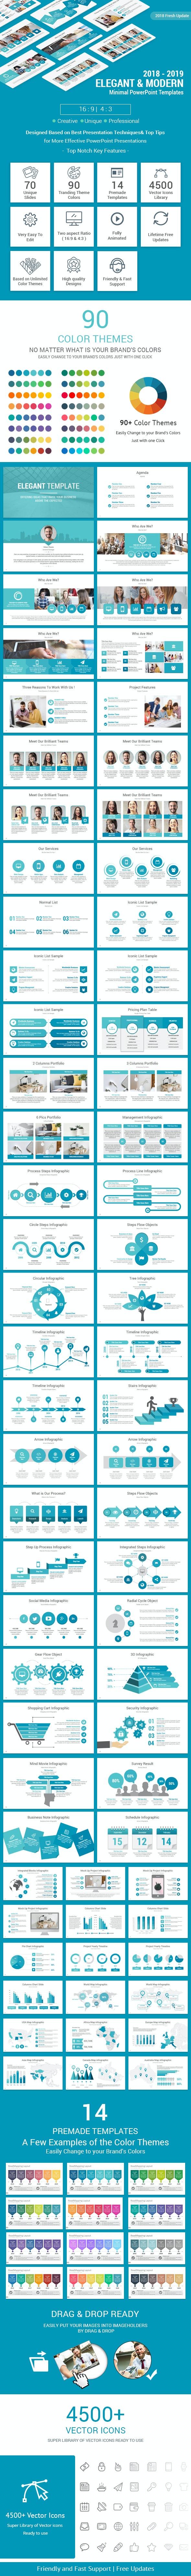 Elegant PowerPoint Presentation Template - Business PowerPoint Templates